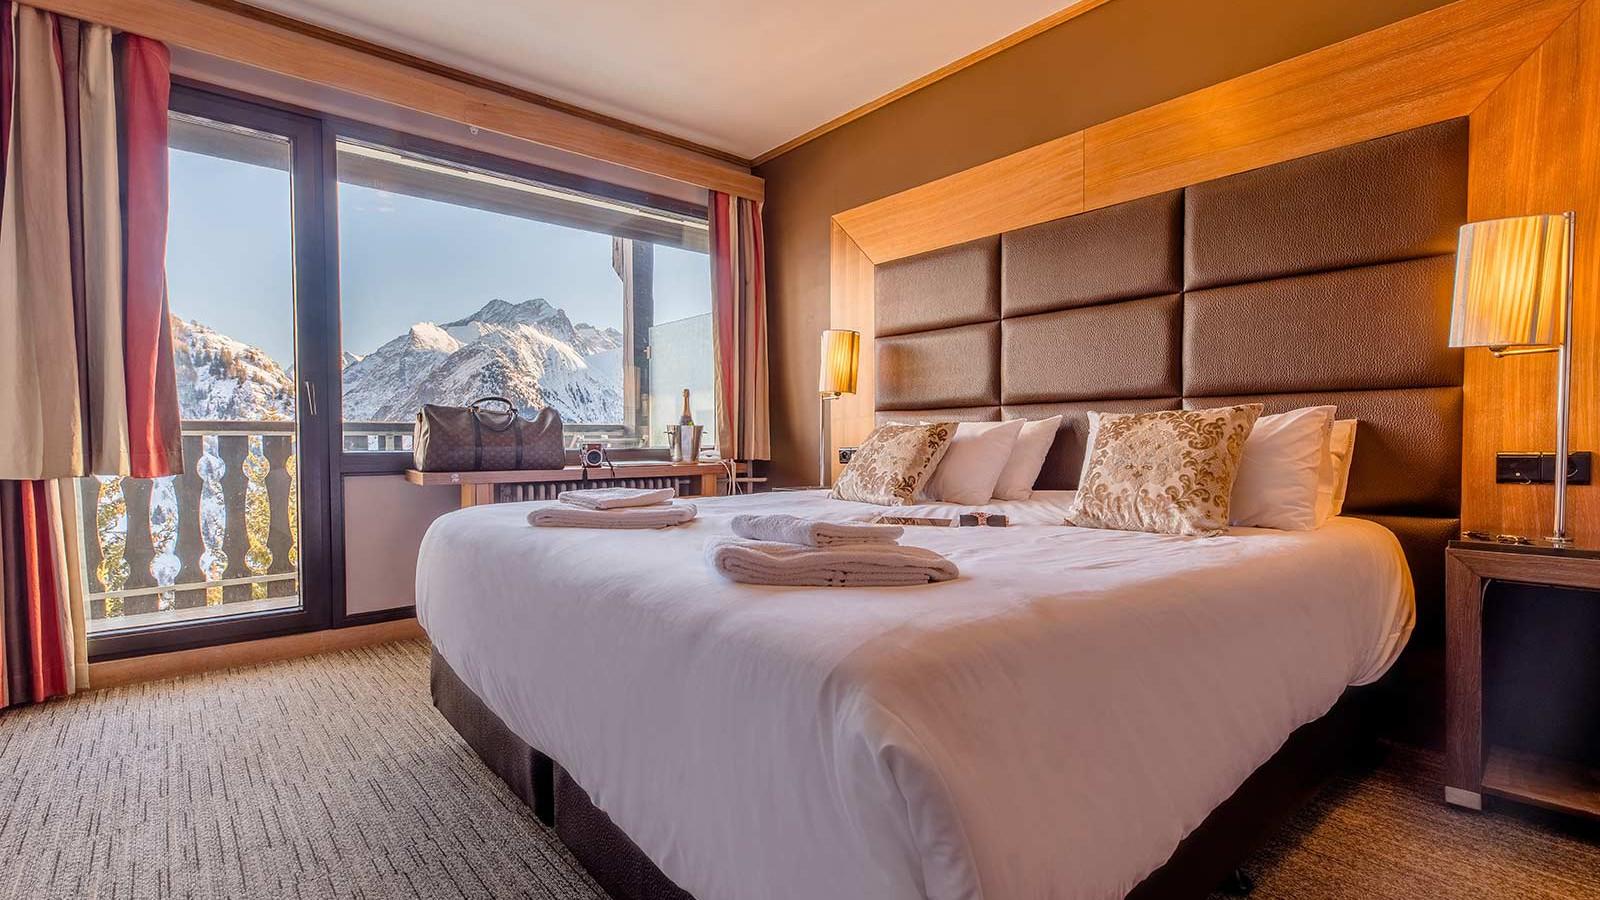 Hôtel Ibiza, Les Deux Alpes - Chambres